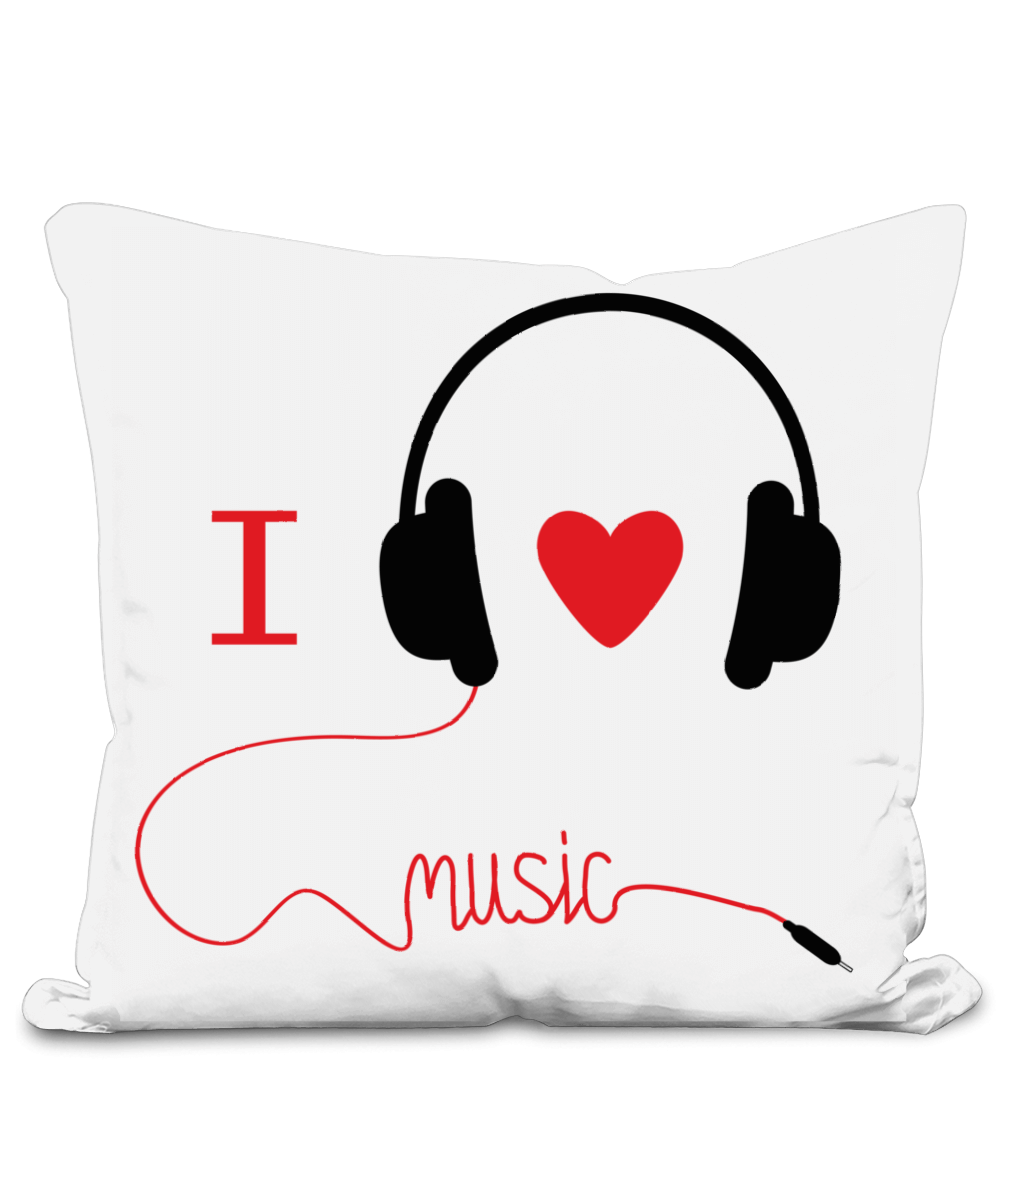 Cushions Throws Soft Furnishings